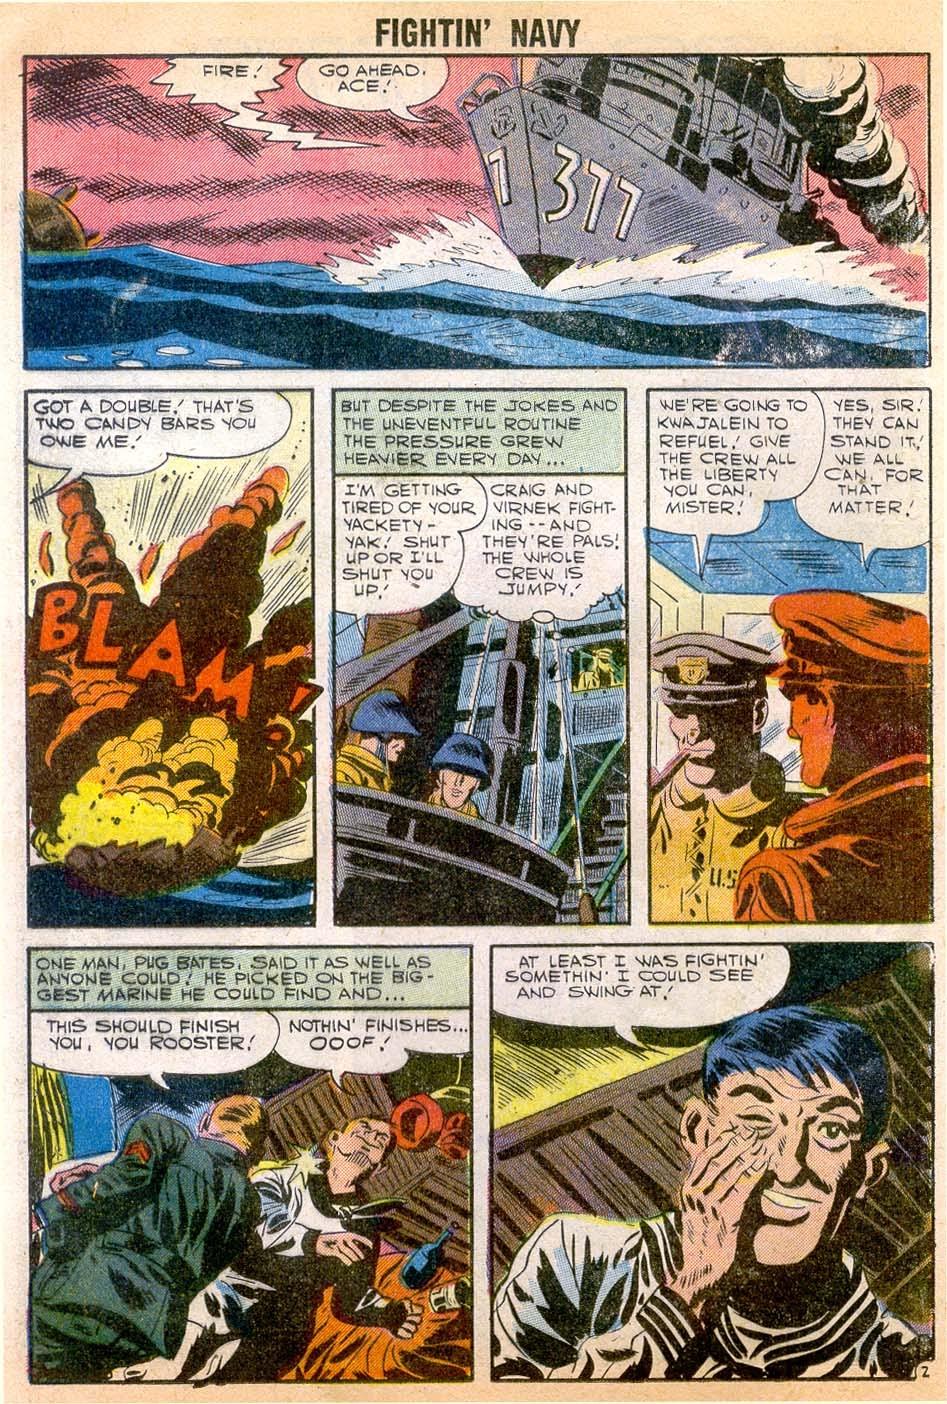 Read online Fightin' Navy comic -  Issue #79 - 12